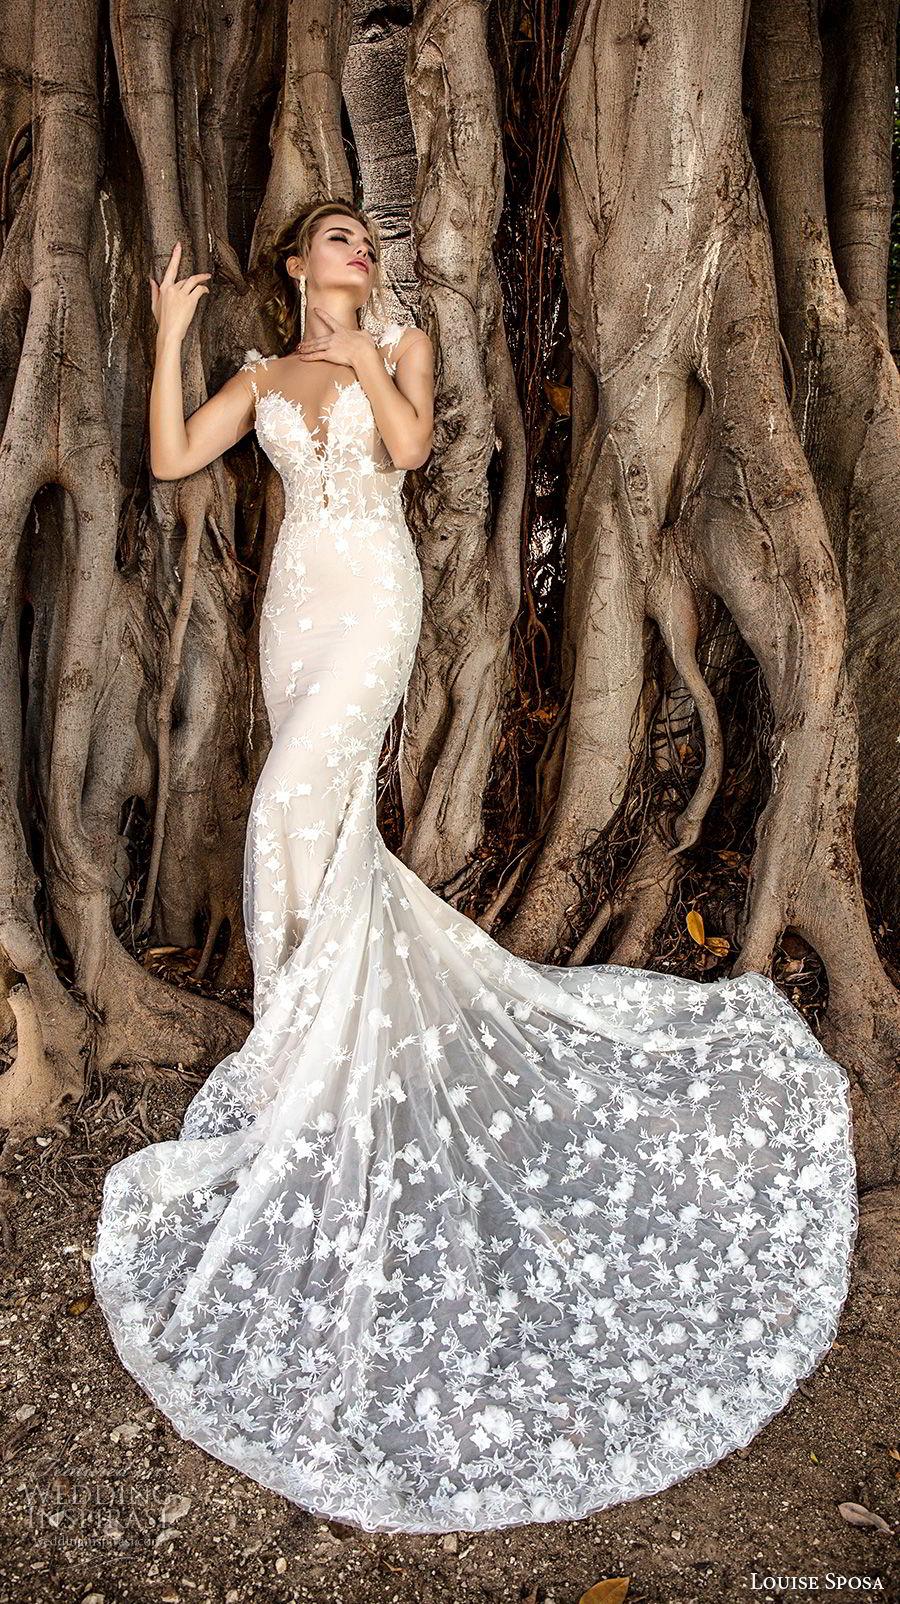 louise sposa 2018 bridal sleeveless illusion bateau deep plunging sweetheart neckline full embellishment elegant sheath wedding dress sheer button back chapel train (17) mv